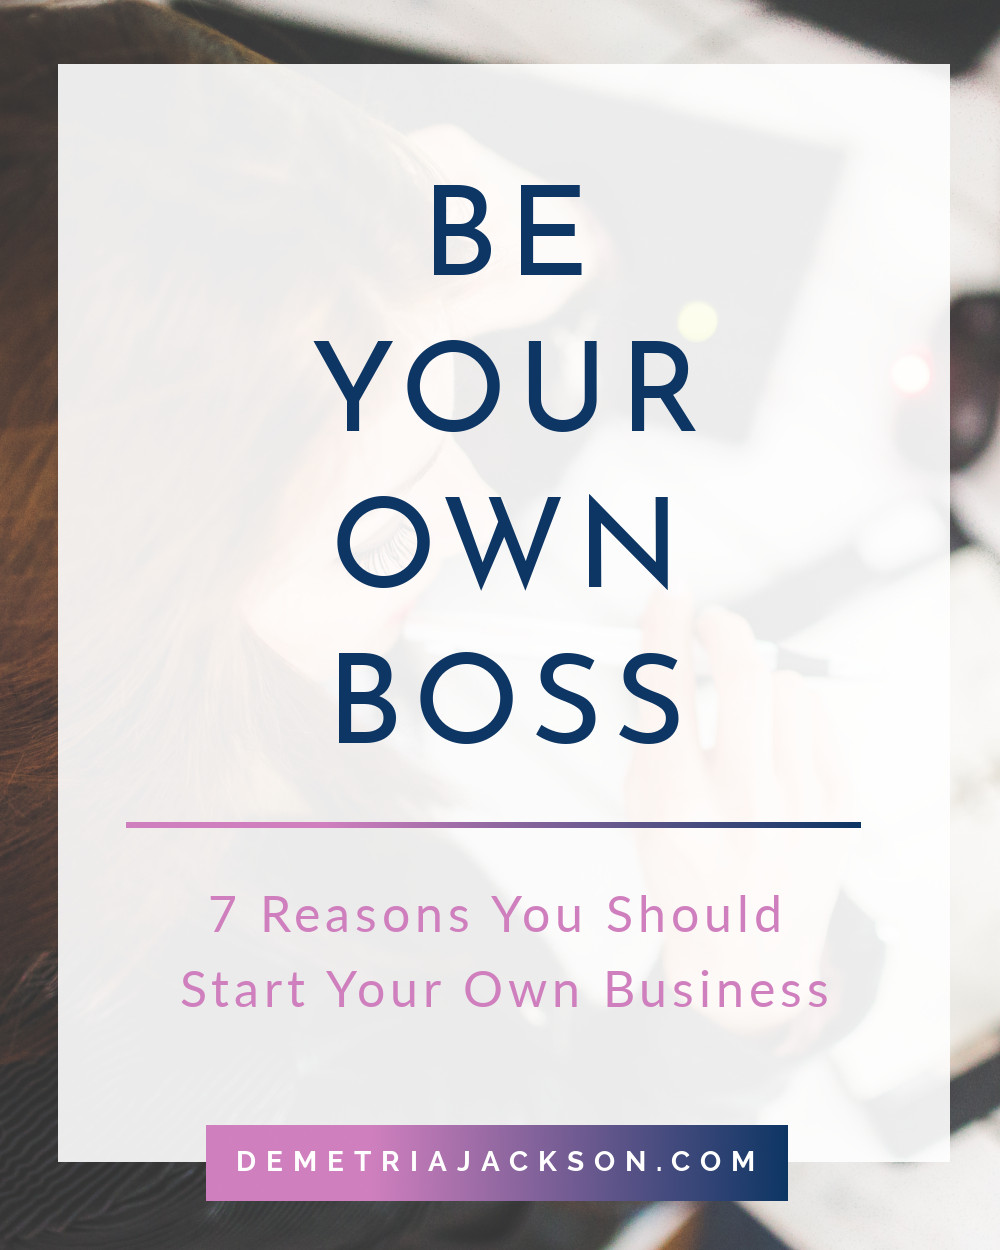 blog-image-7-reasons-you-should-start-a-business.jpeg